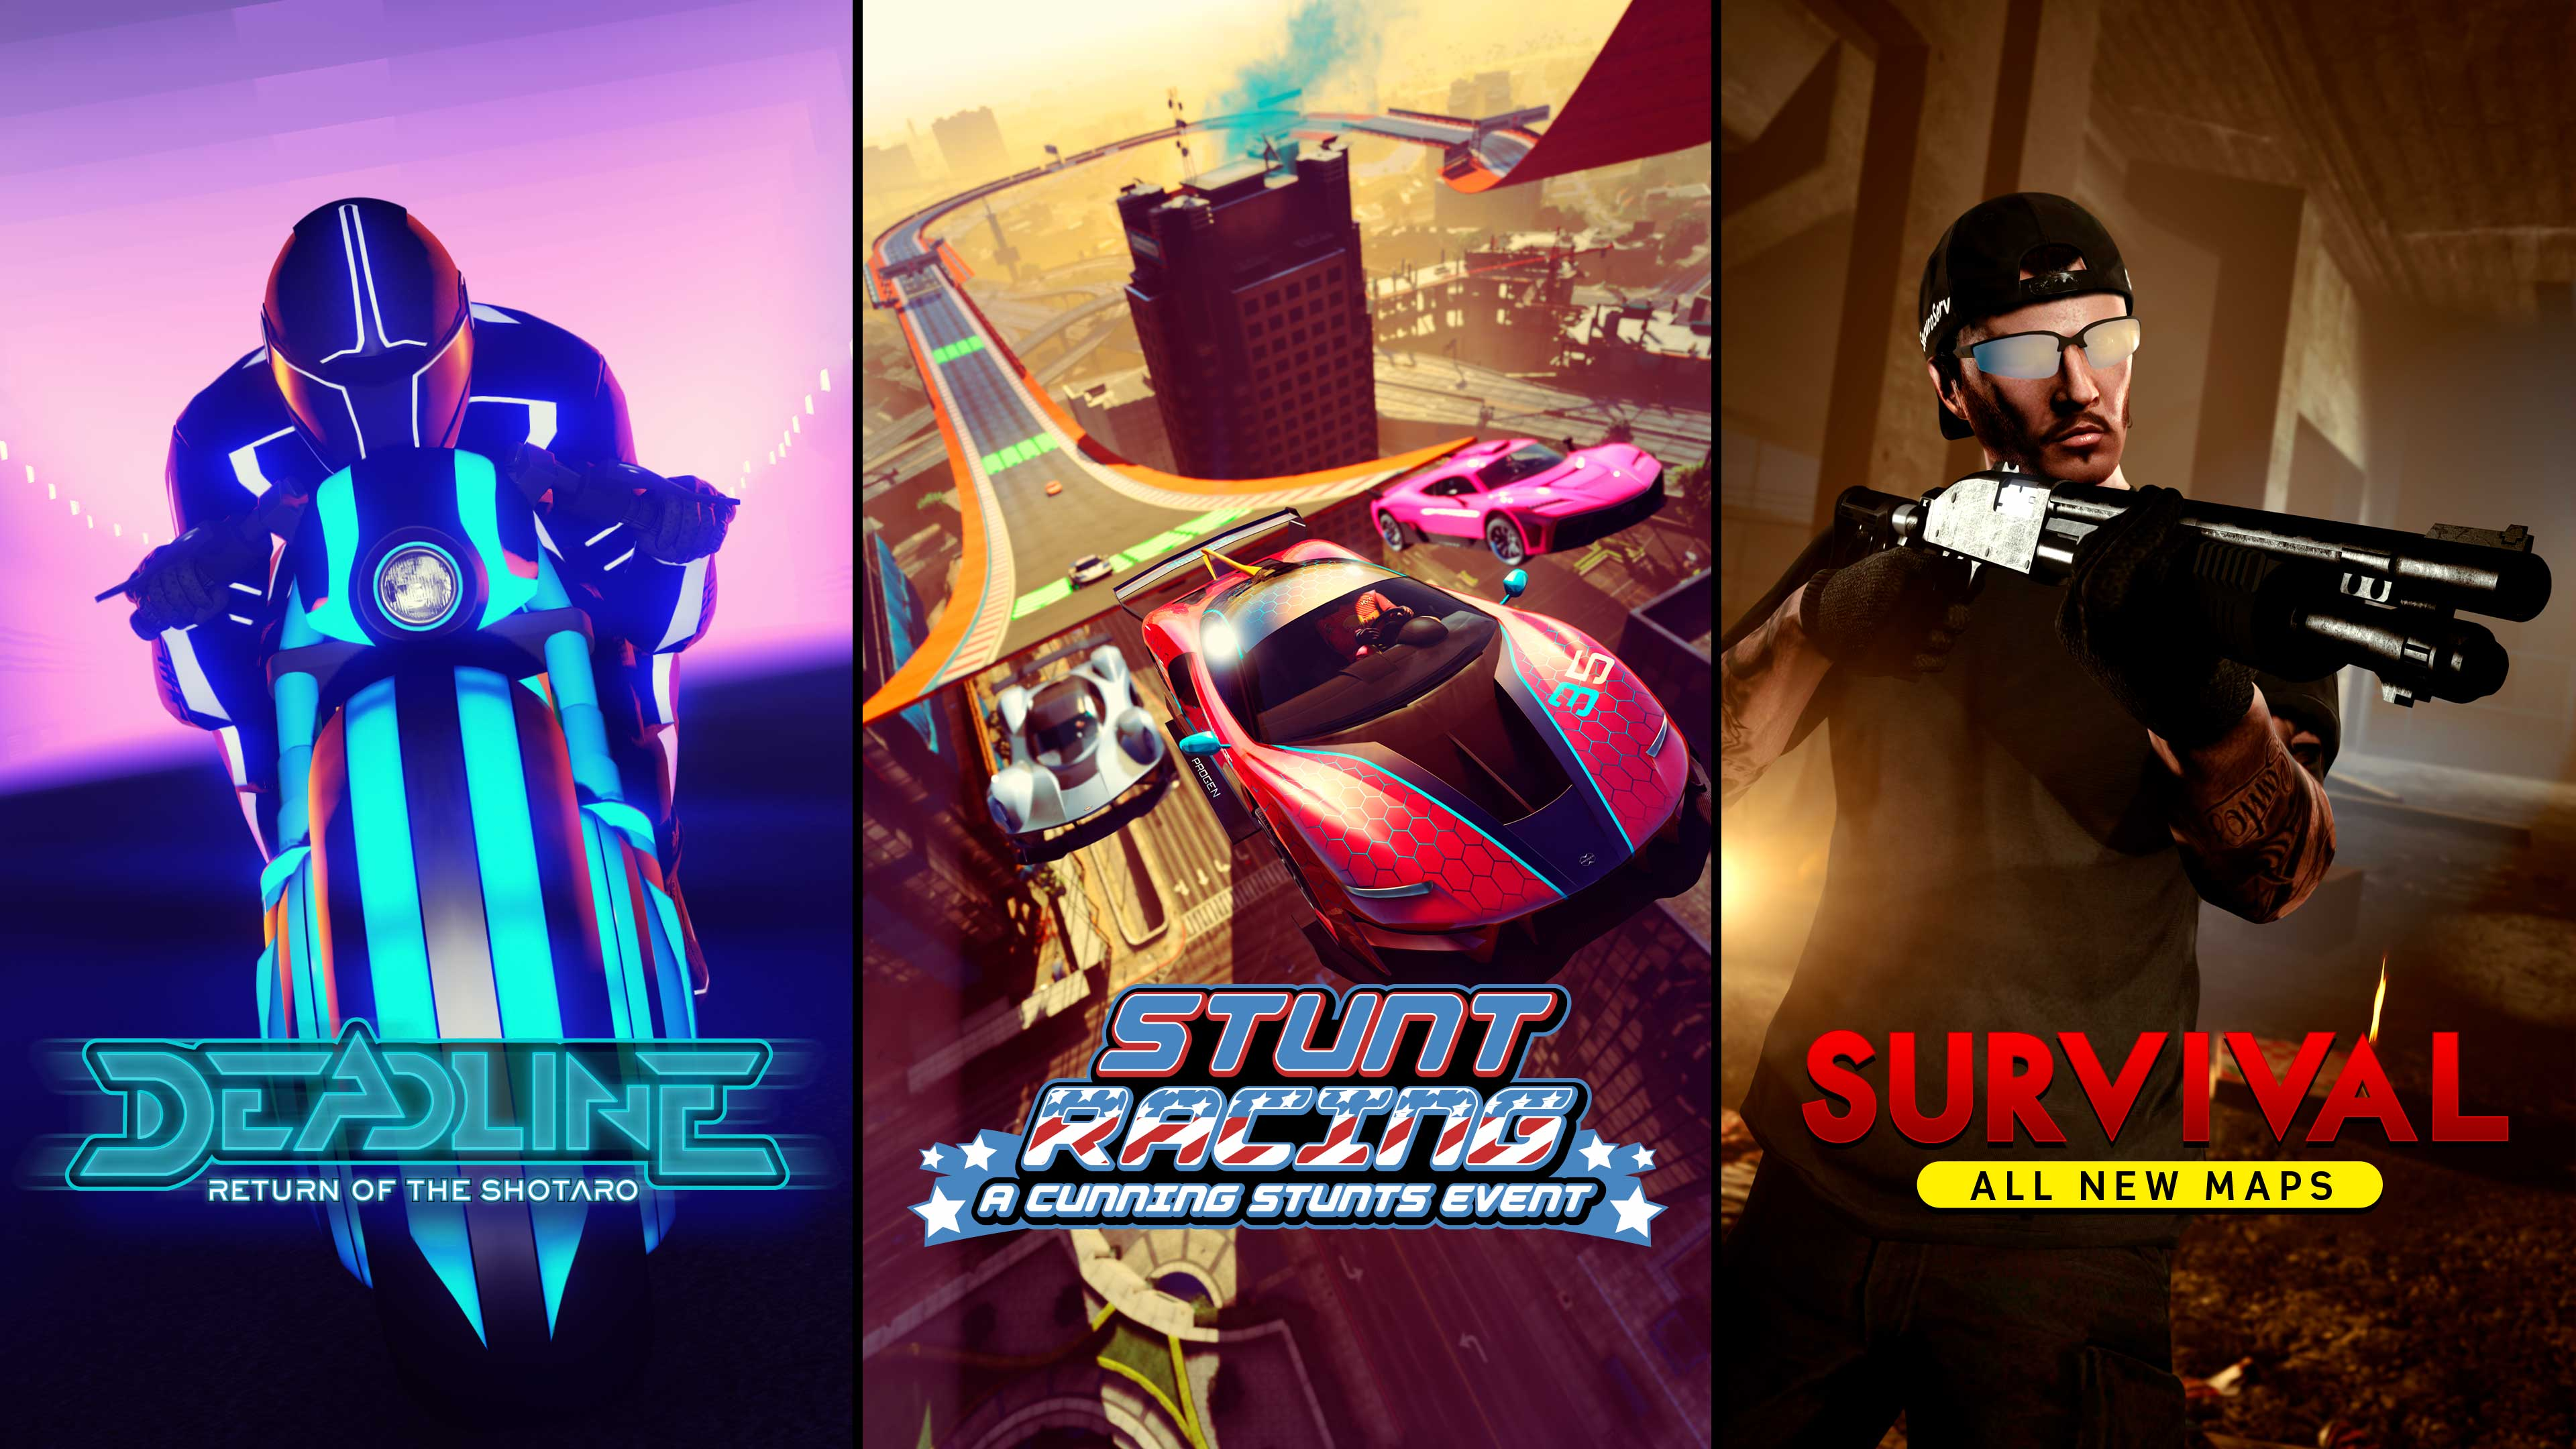 Grand theft auto videos of GTA News: